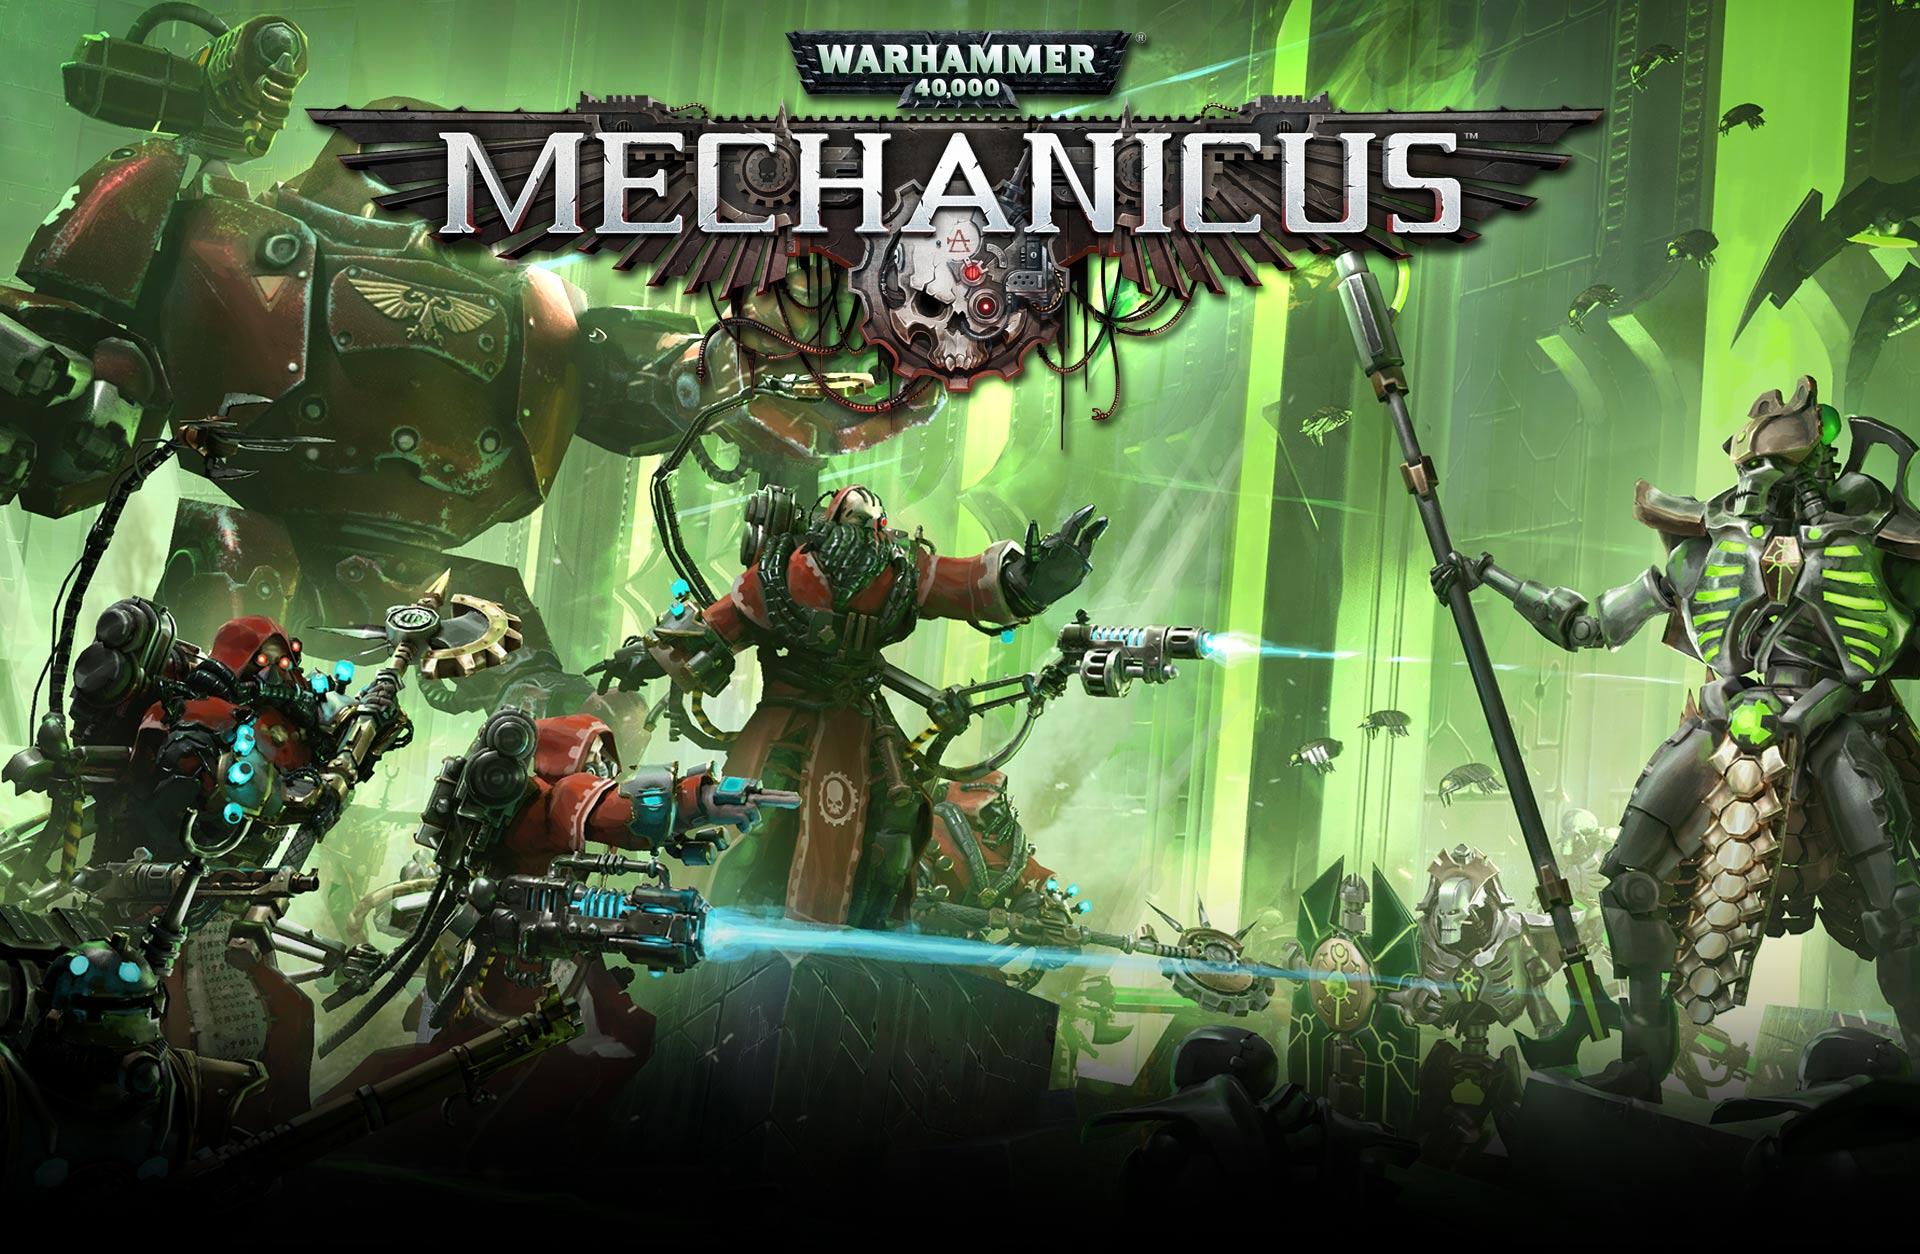 Warhammer 40k: Mechanicus: bello ma non si applica